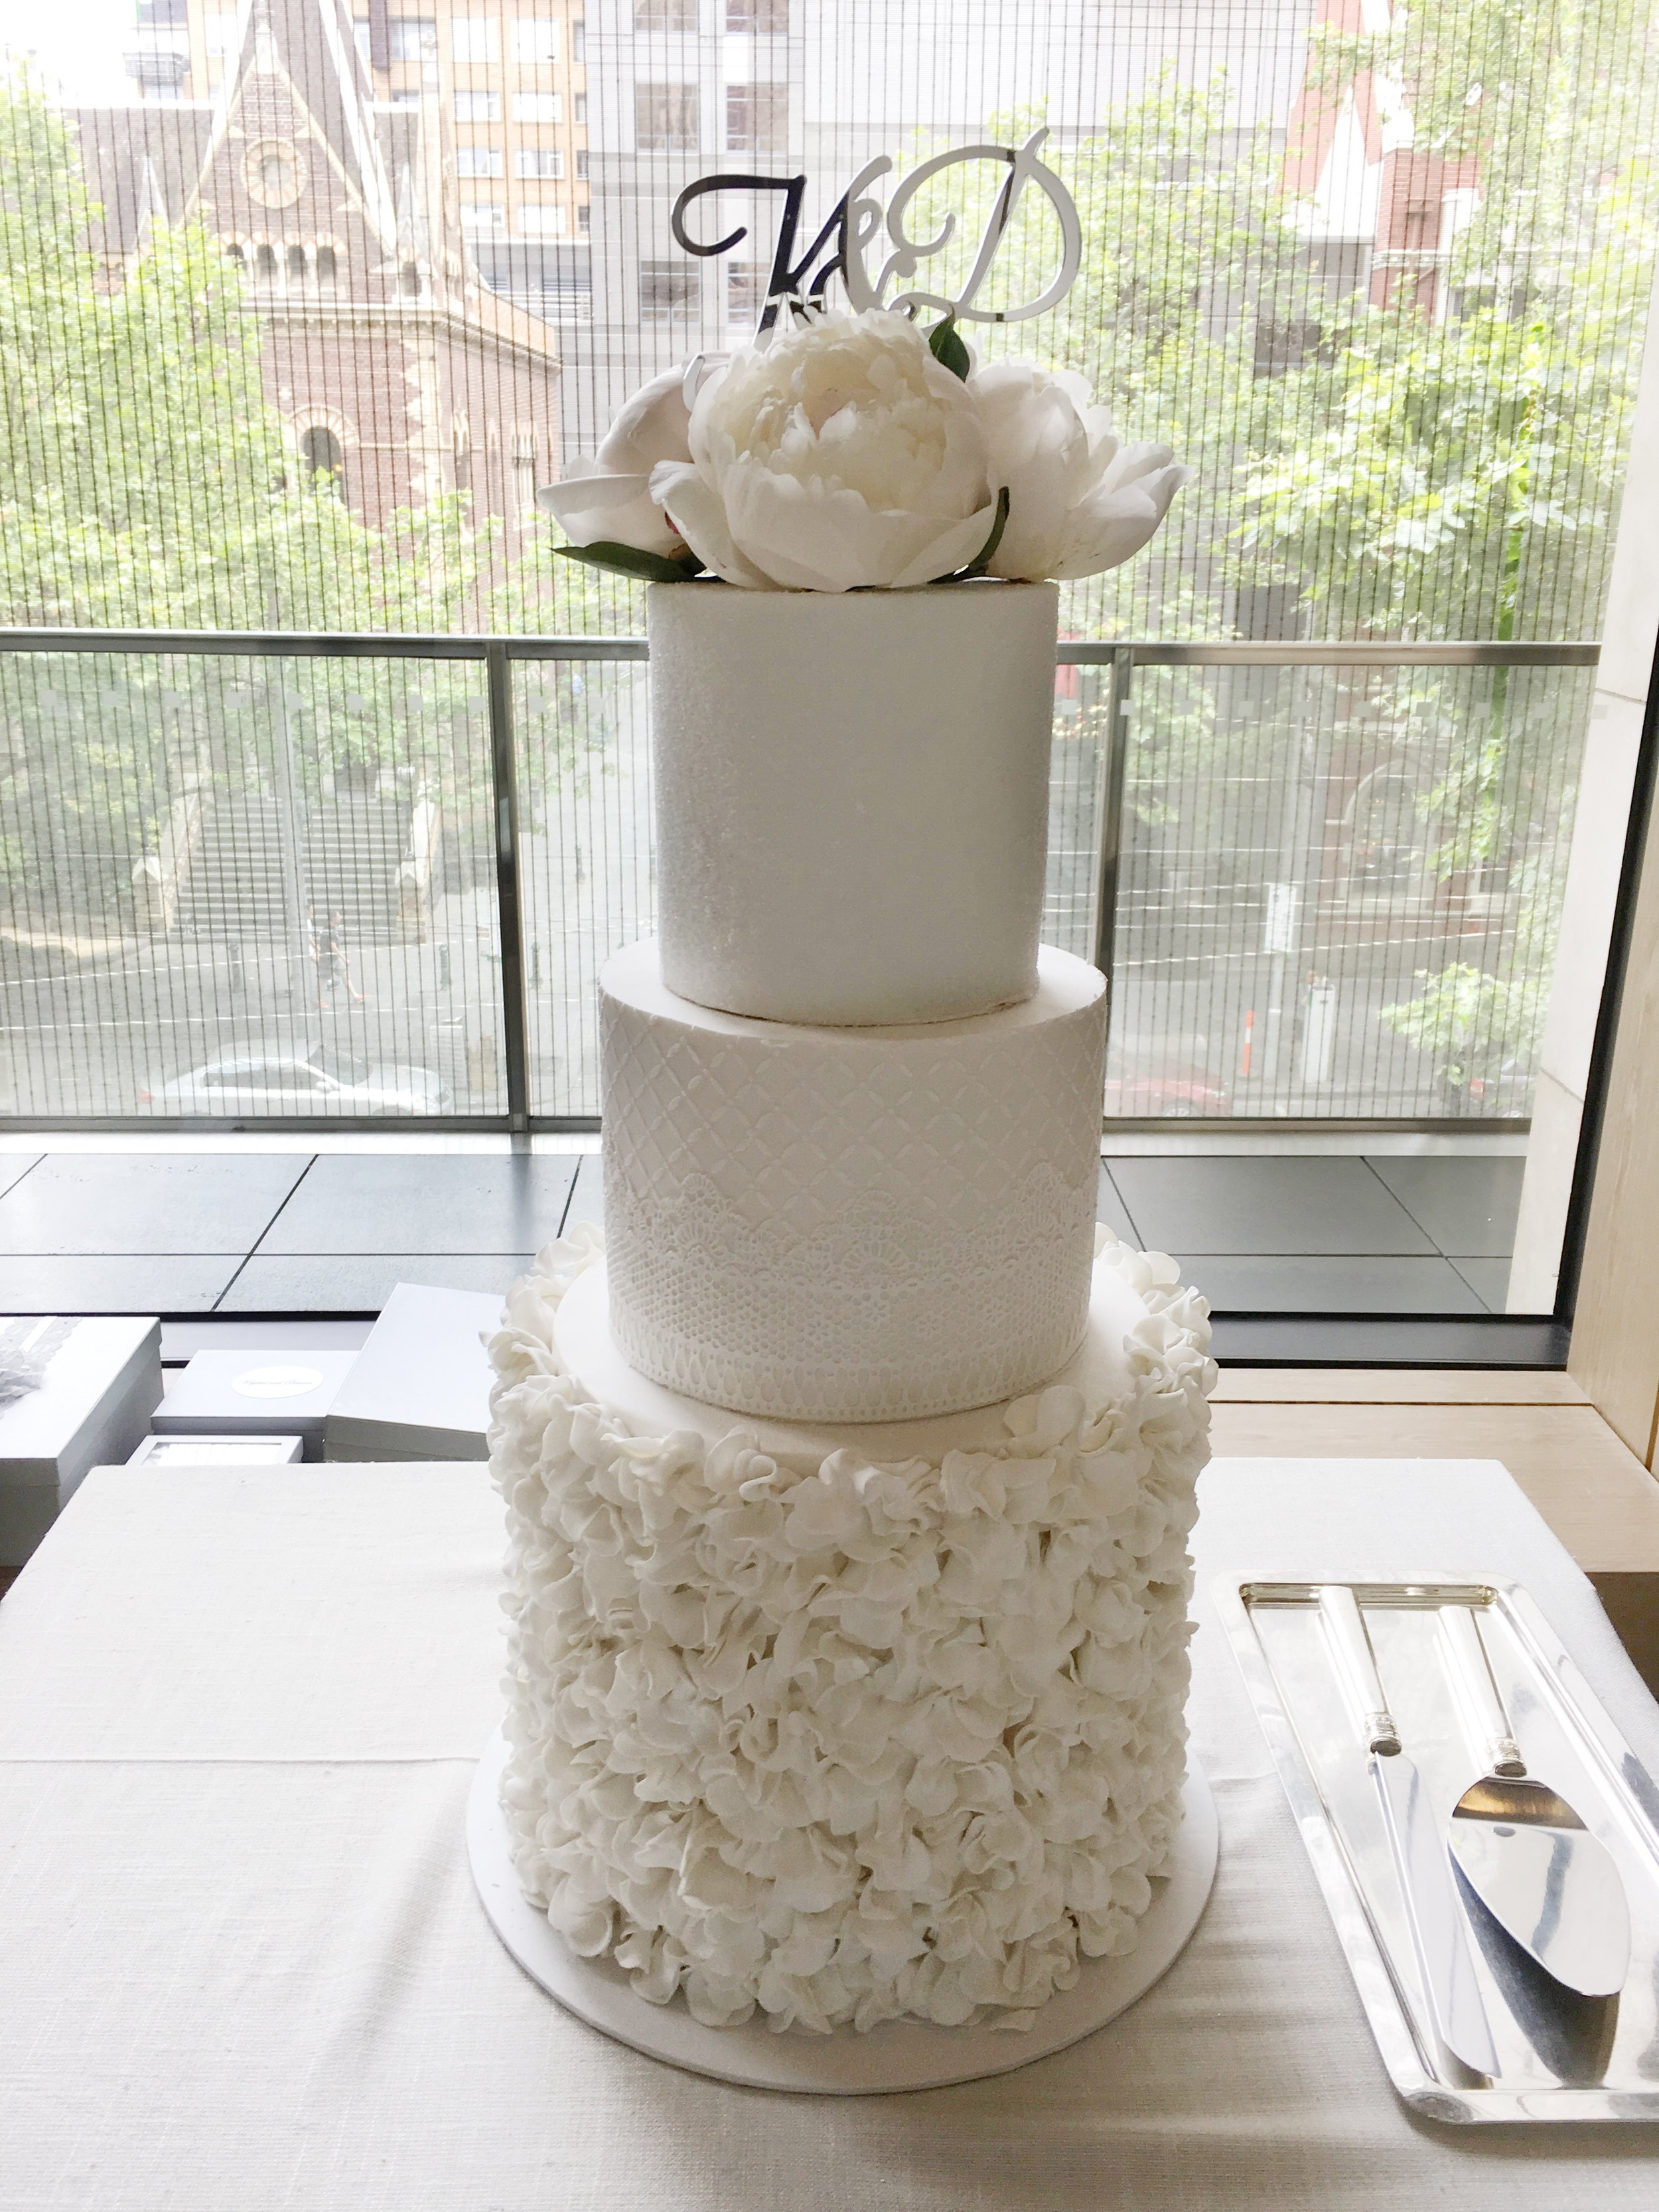 Copy of White Wedding Cake with Ruffles